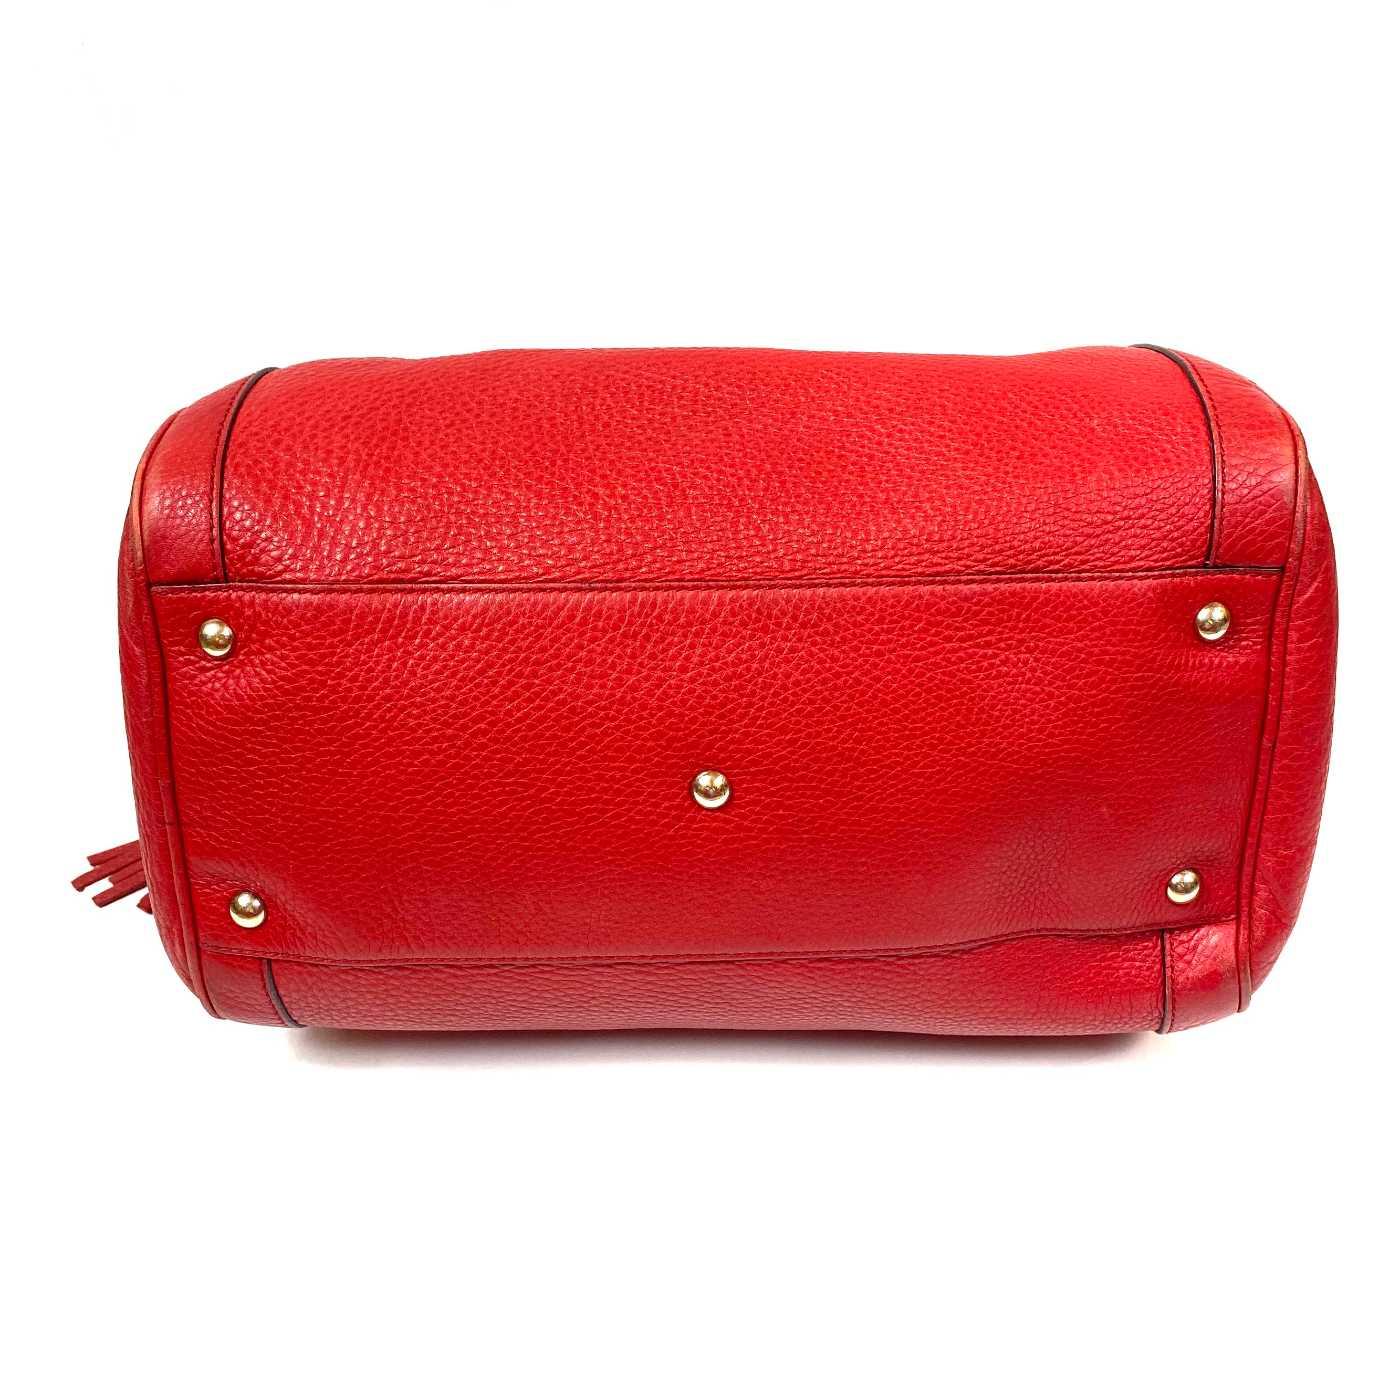 Bolsa Gucci Boston Soho Vermelha